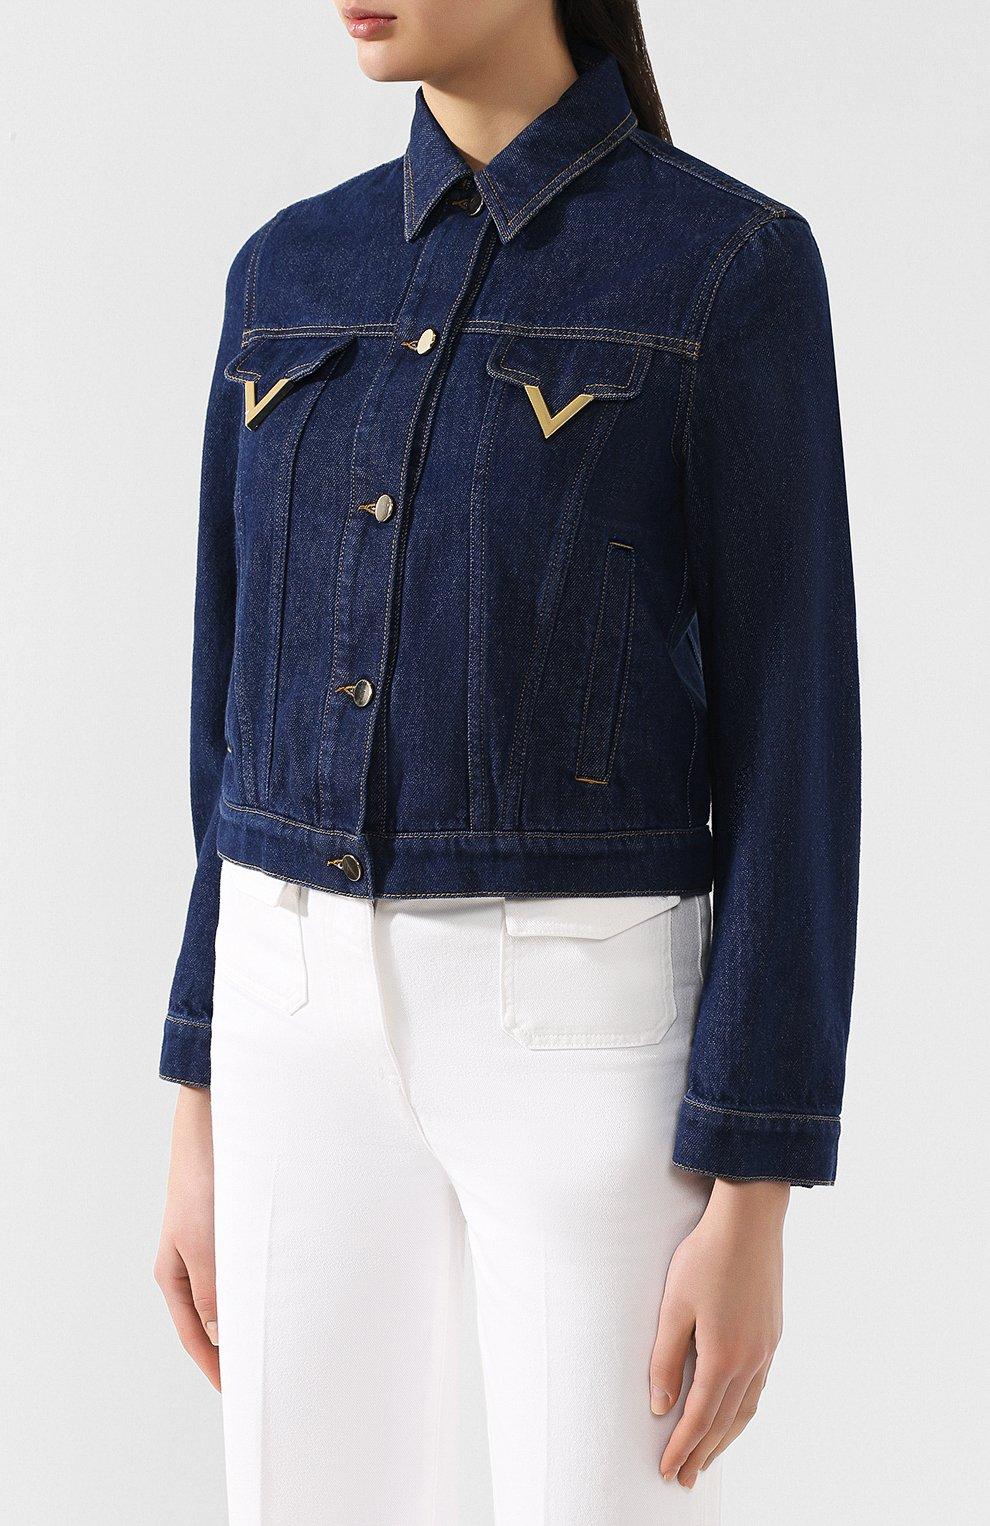 Джинсовая куртка Valentino темно-синяя | Фото №3